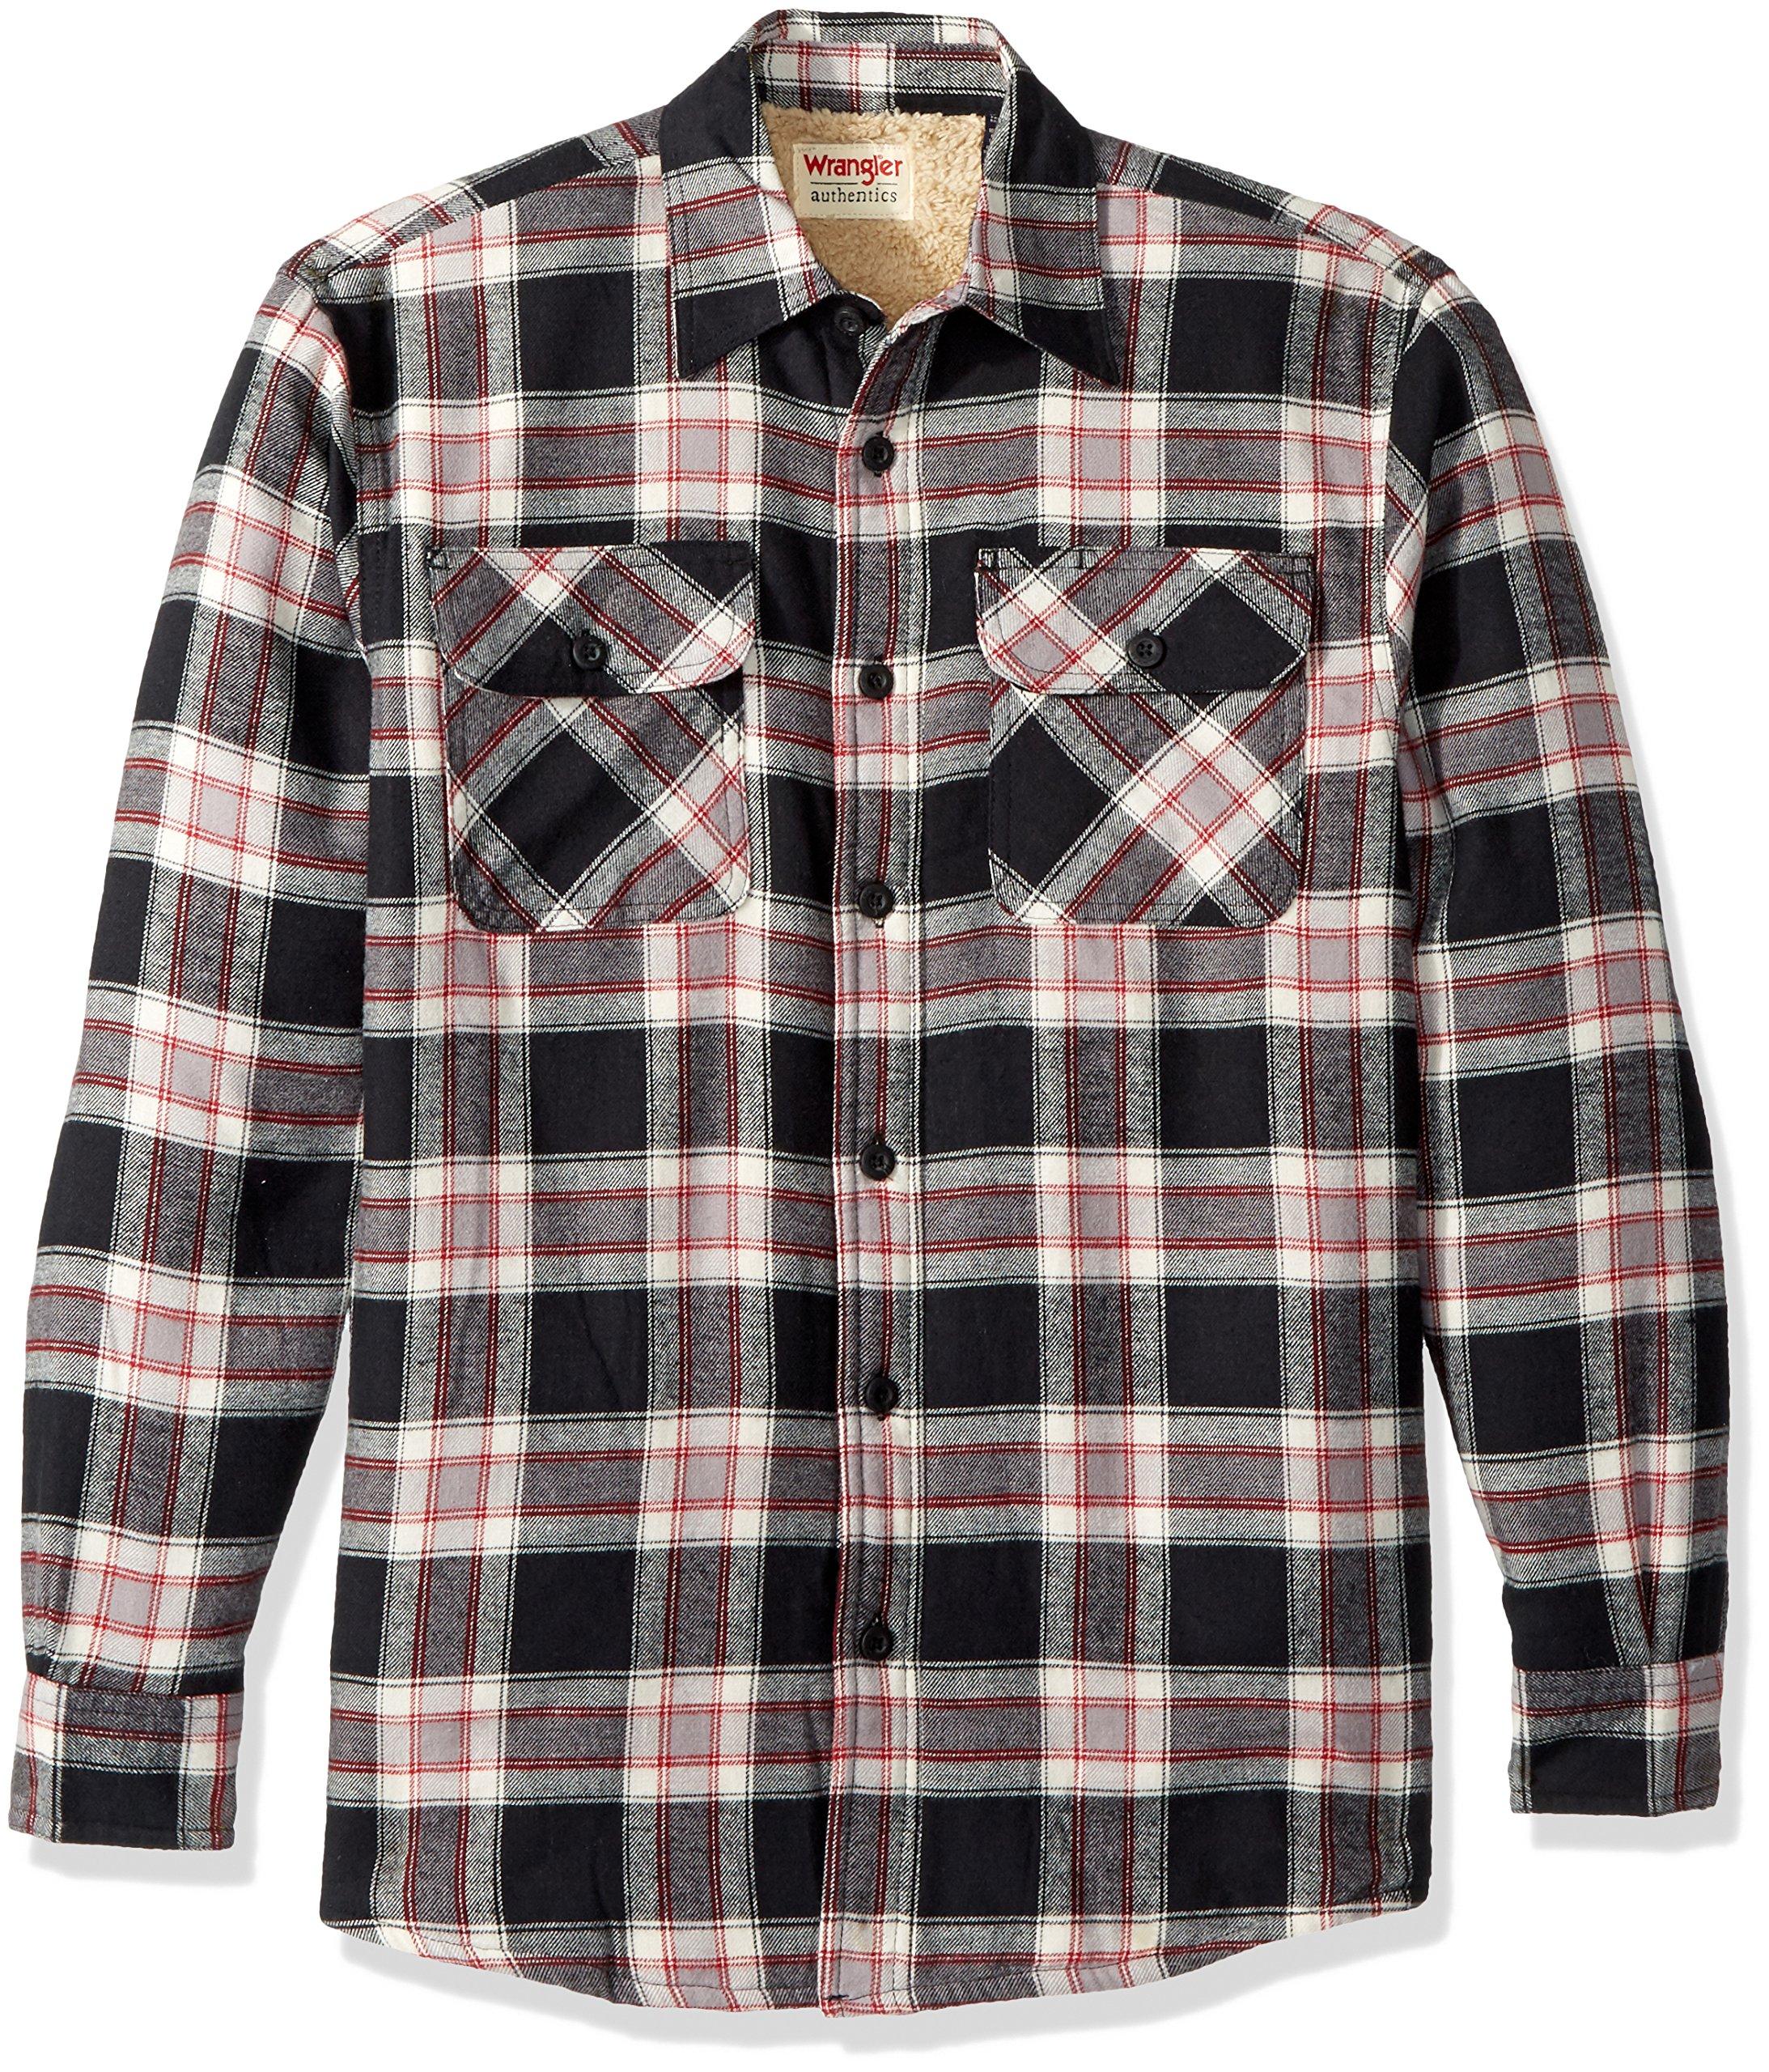 Wrangler Authentics Men's Long Sleeve Sherpa Lined Flannel Shirt Jacket, Caviar, M